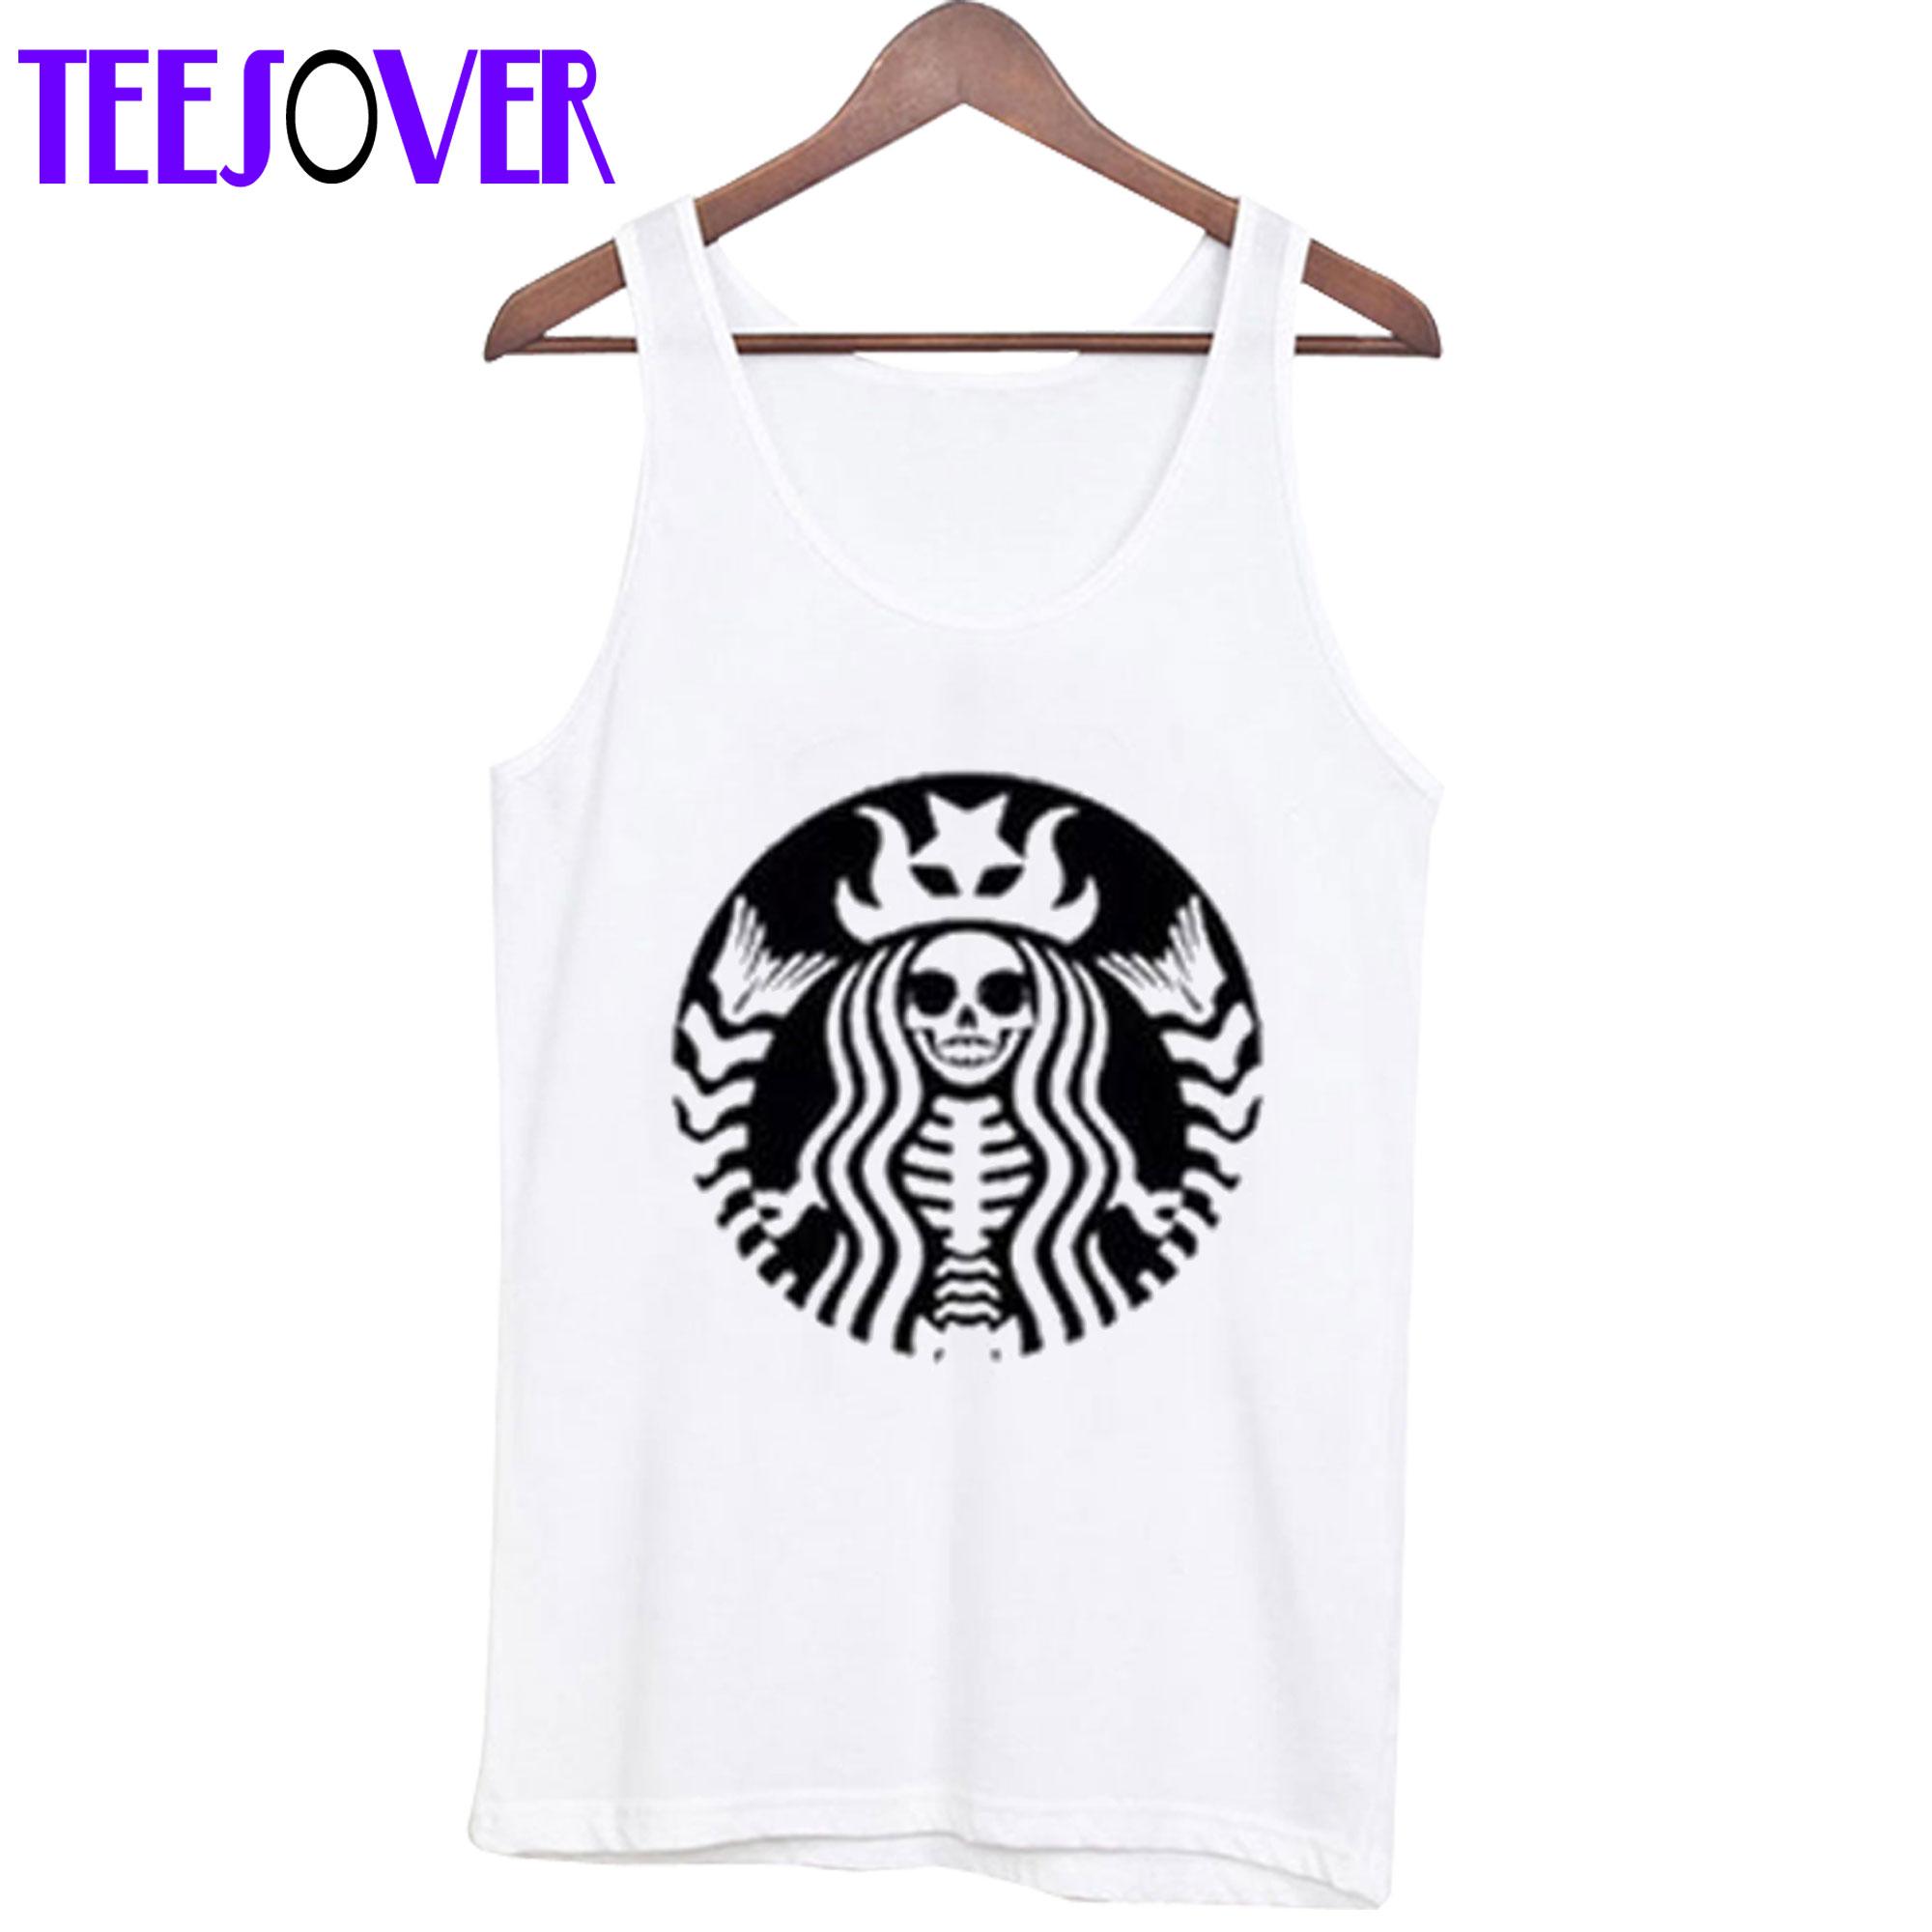 Starbucks Skeleton tank top